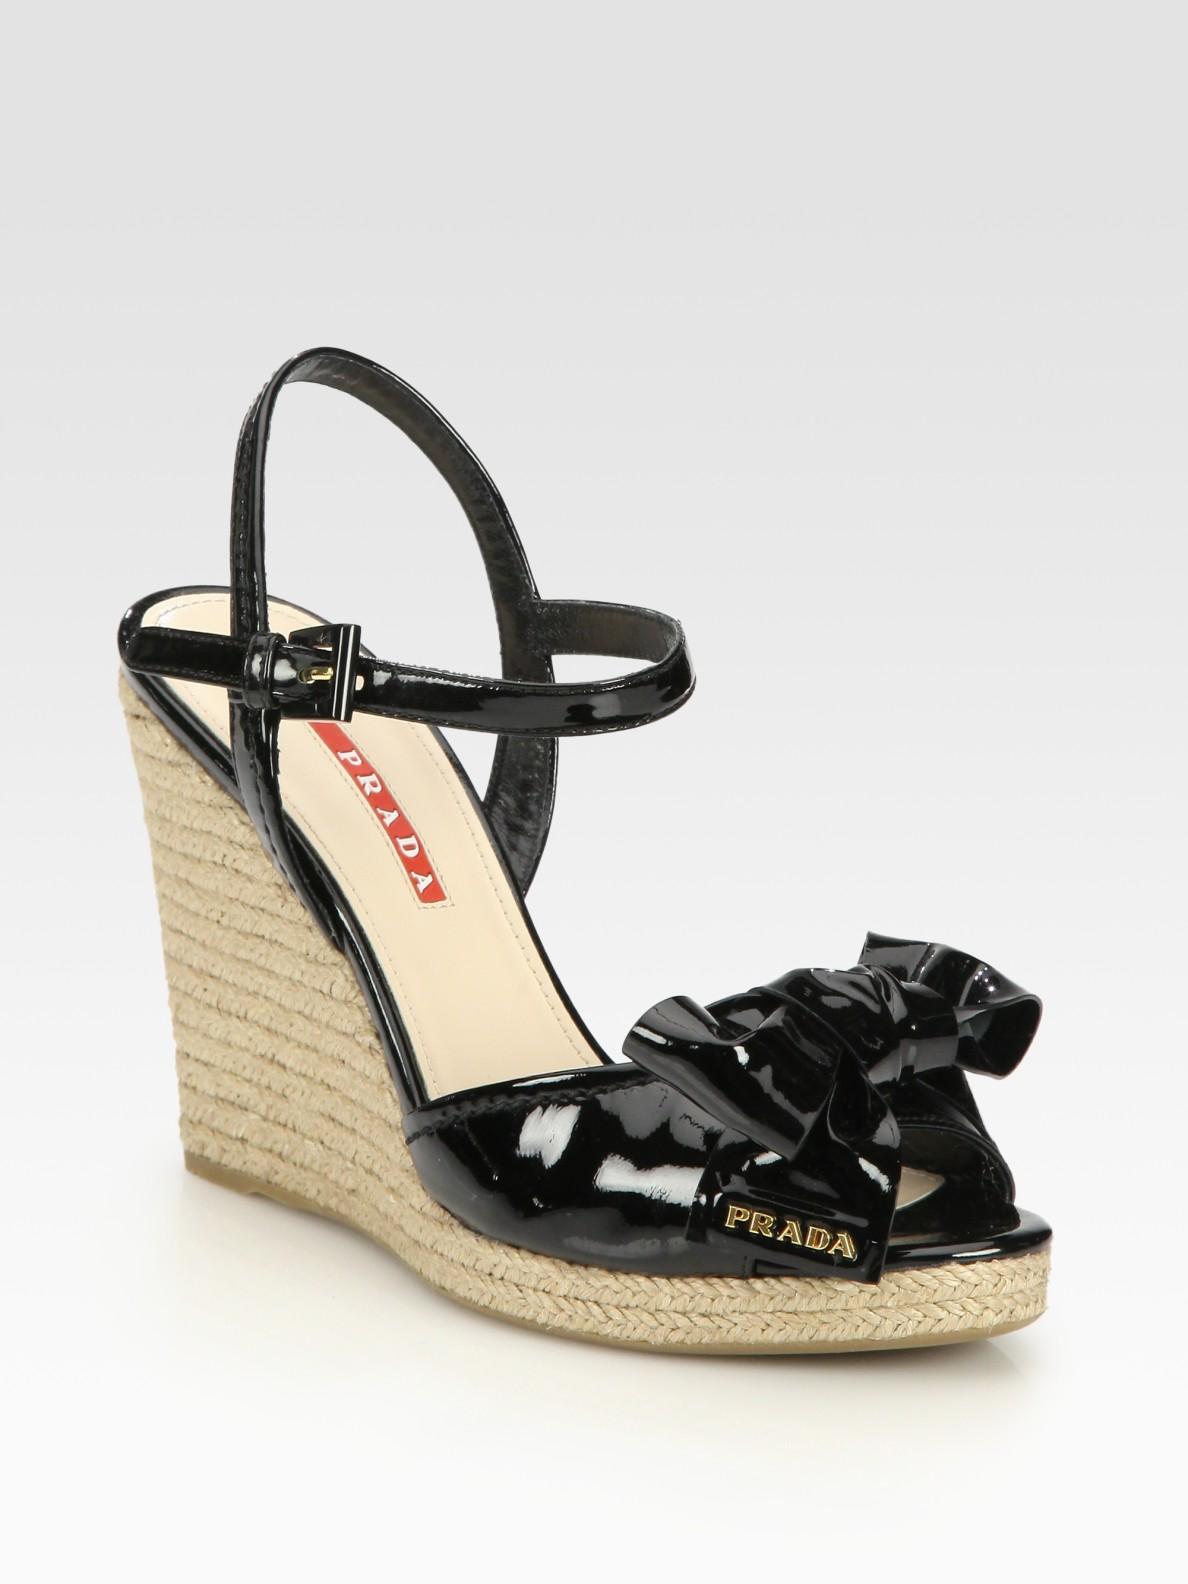 5945601a13d Prada Patent Leather Espadrille Wedge Sandals in Black